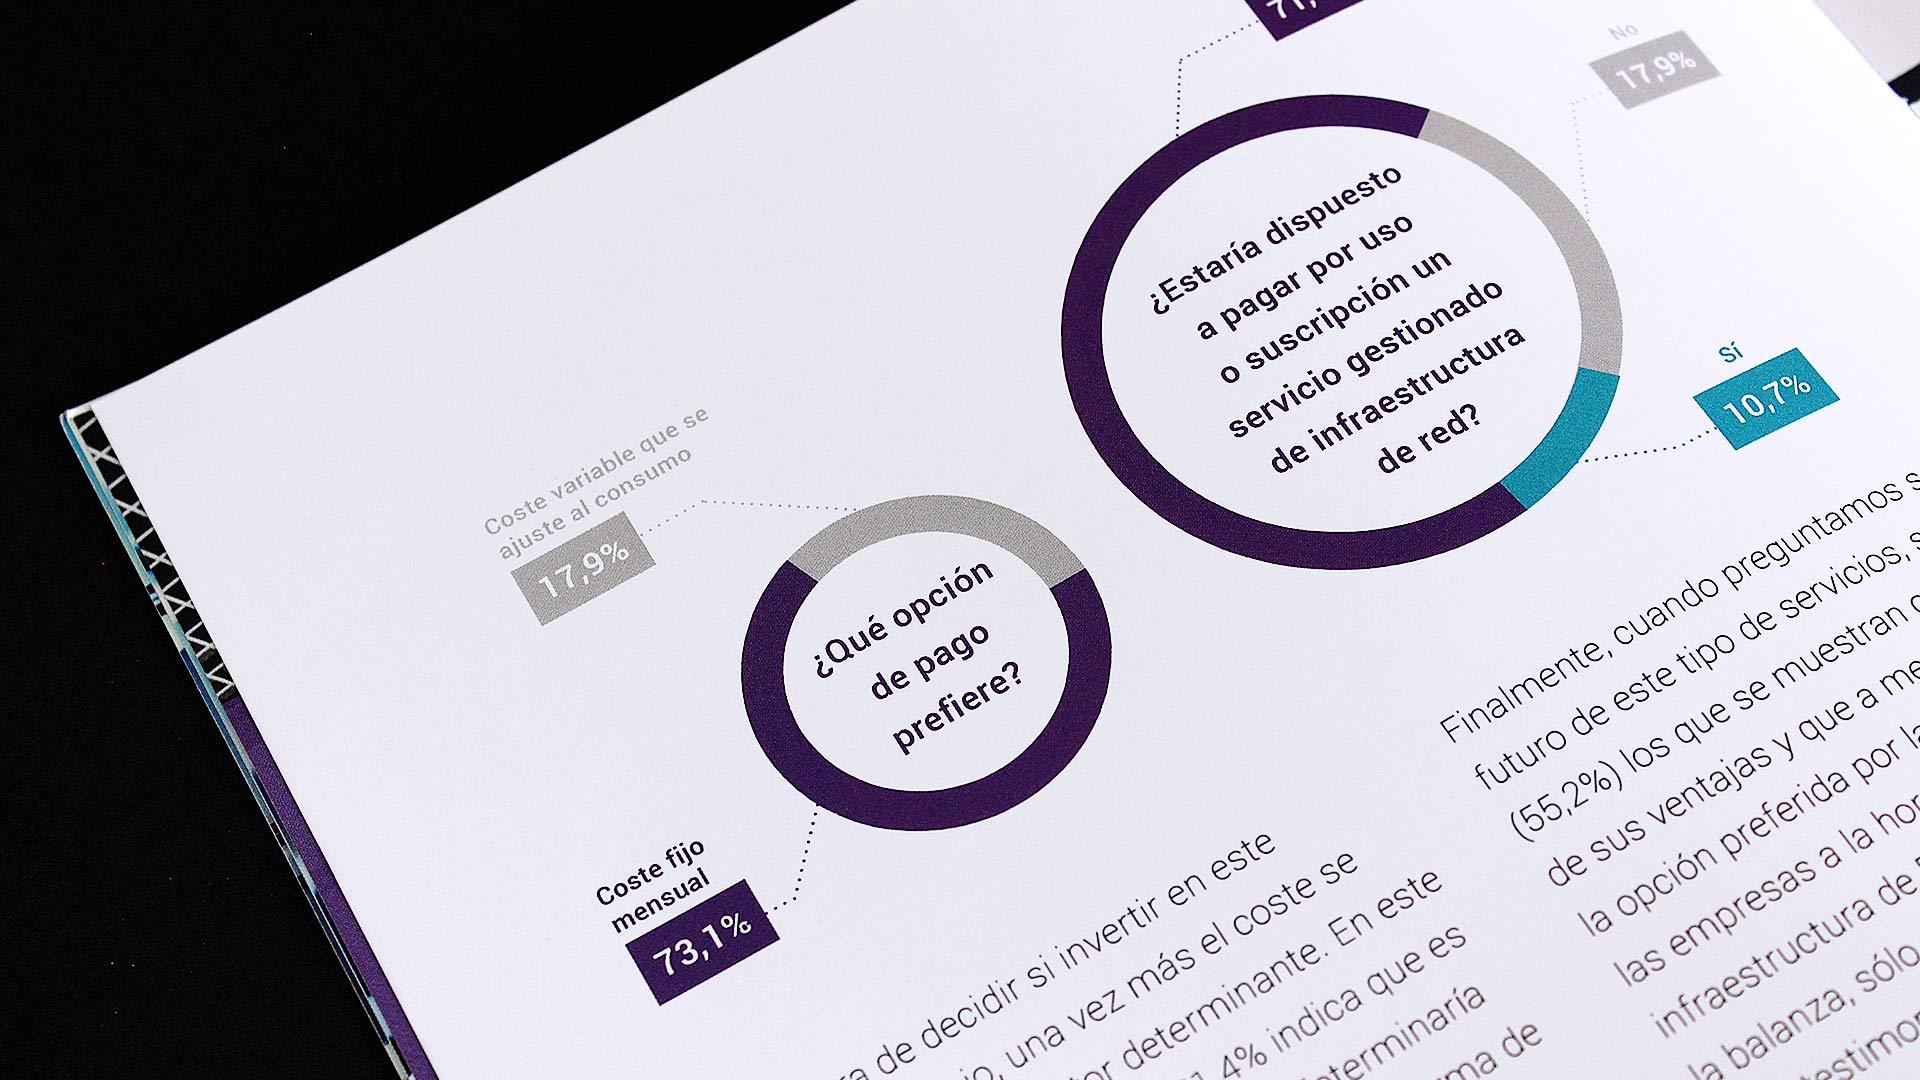 alcatel-content-marketing-informe-resumen-ejecutivo-networkondemand-ebook-2016-22